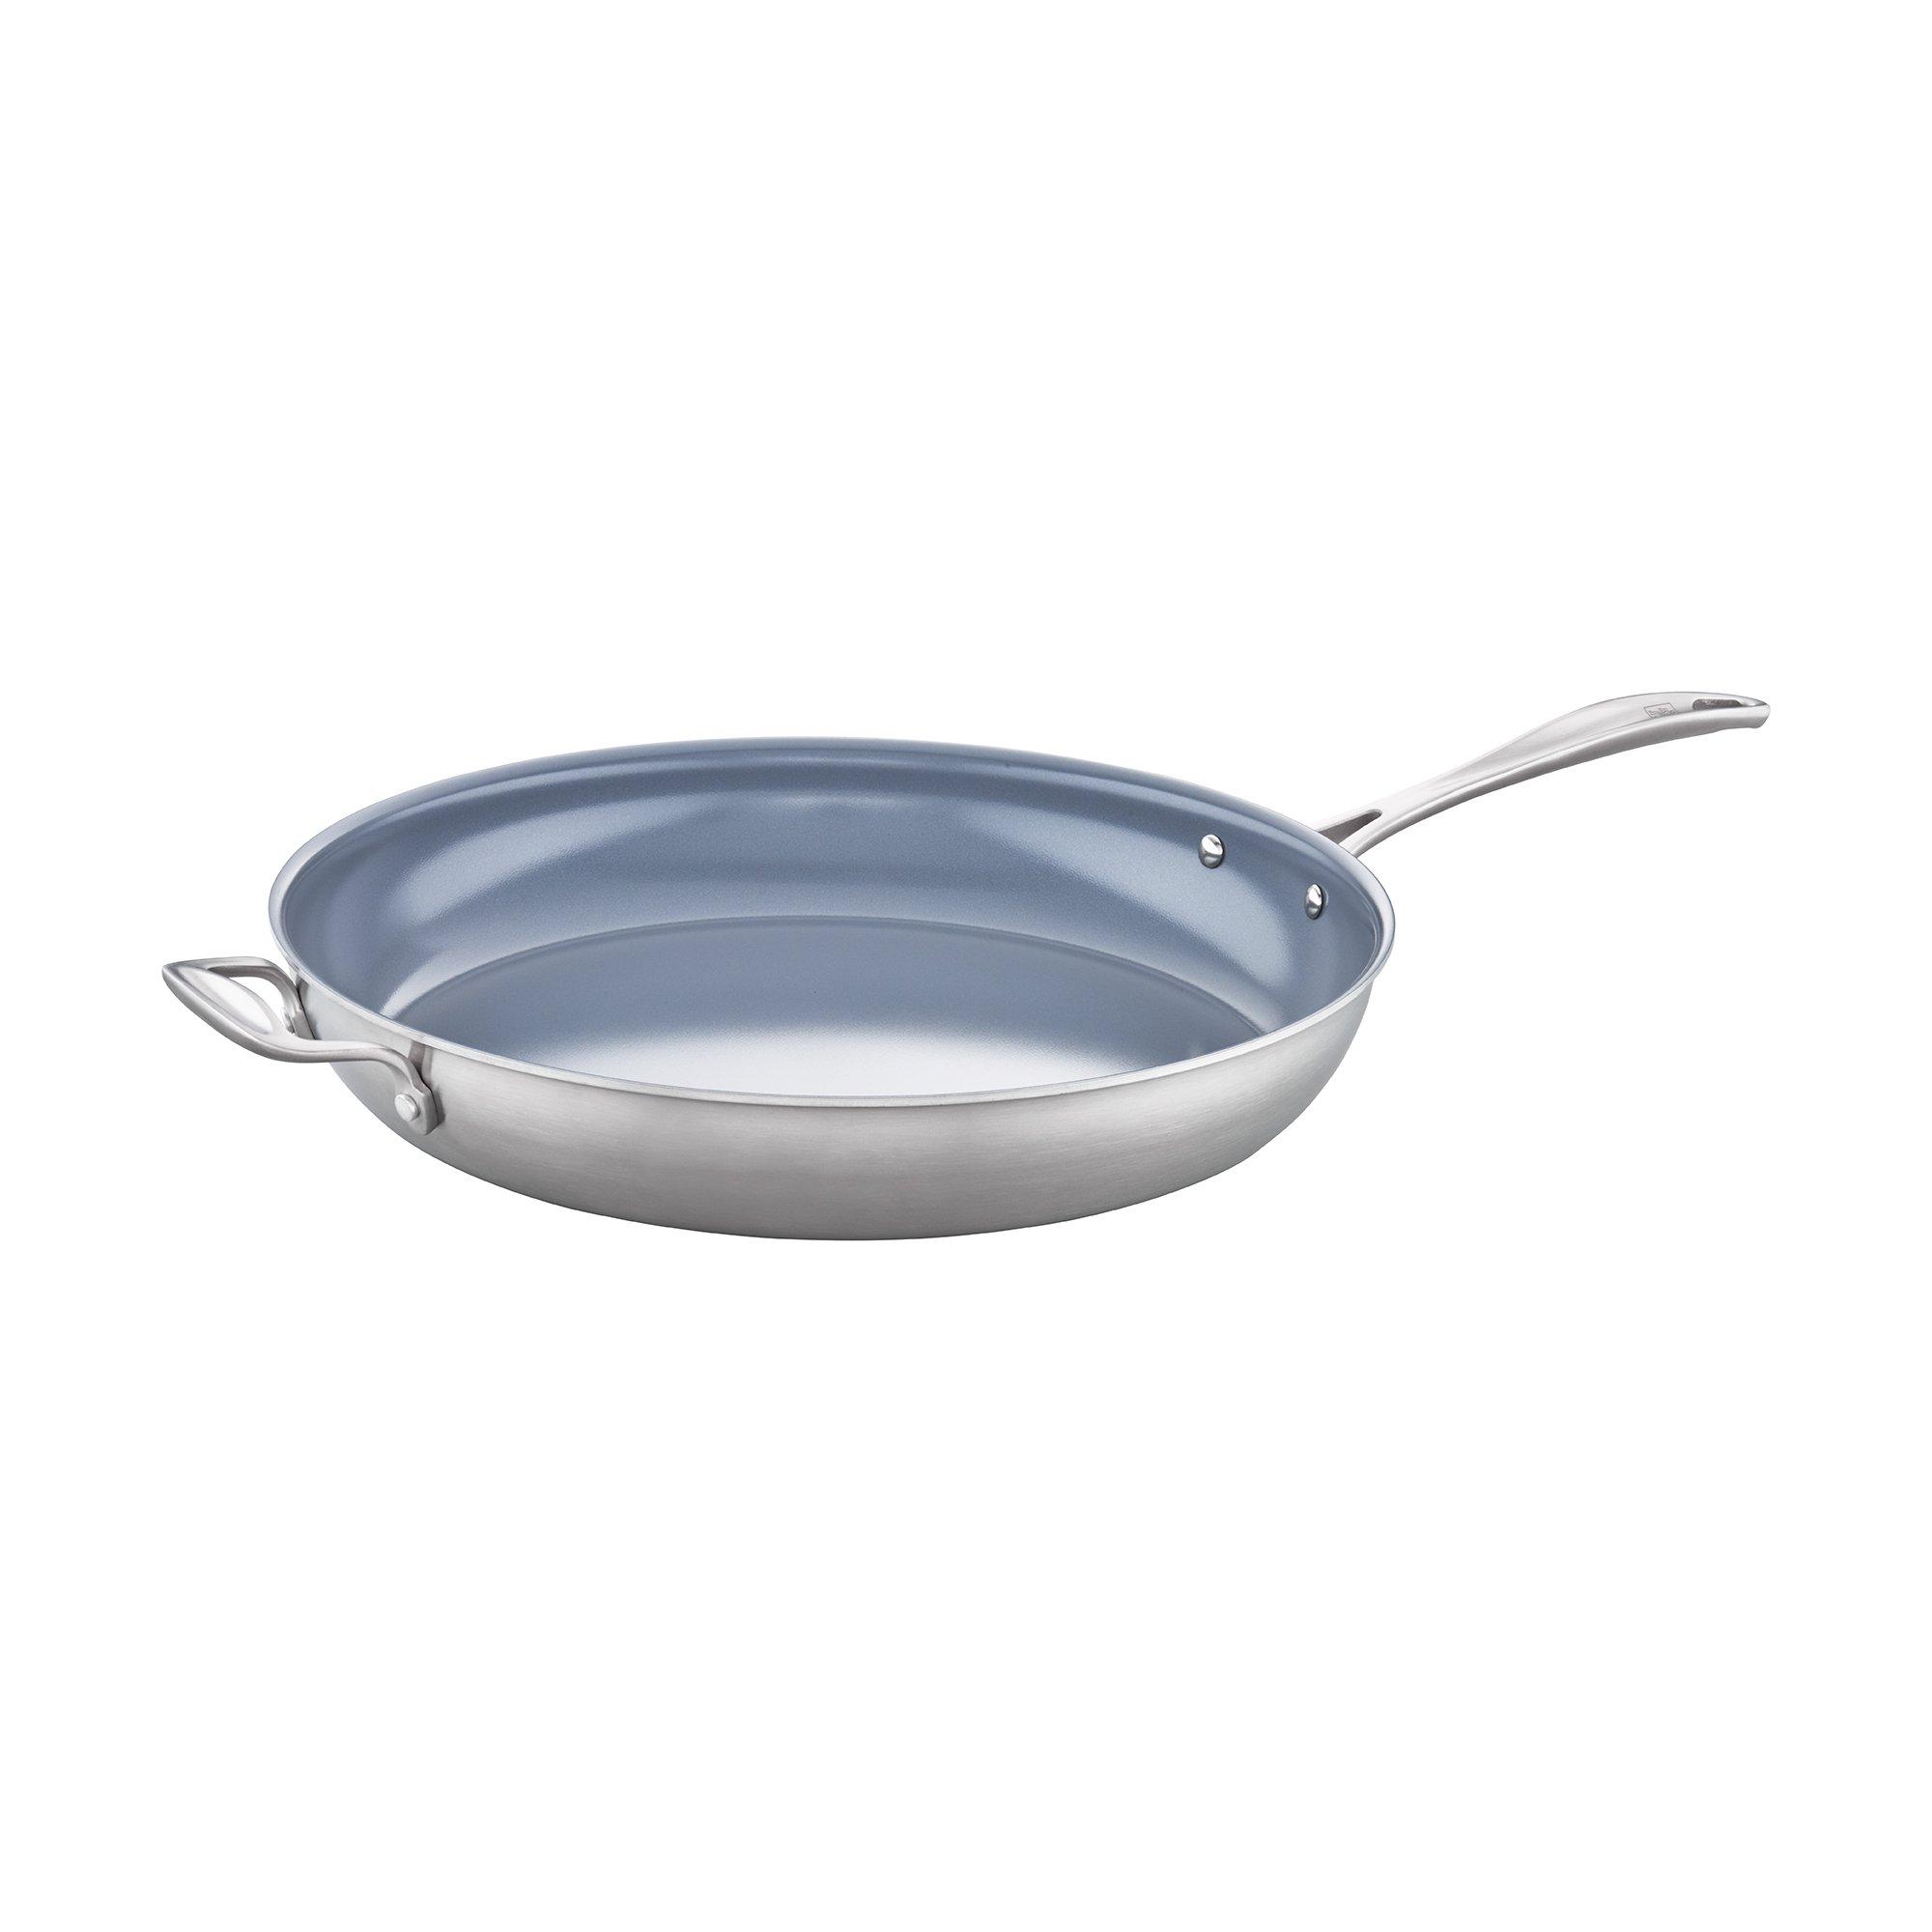 ZWILLING Spirit 3-ply 14'' Stainless Steel Ceramic Nonstick Fry Pan